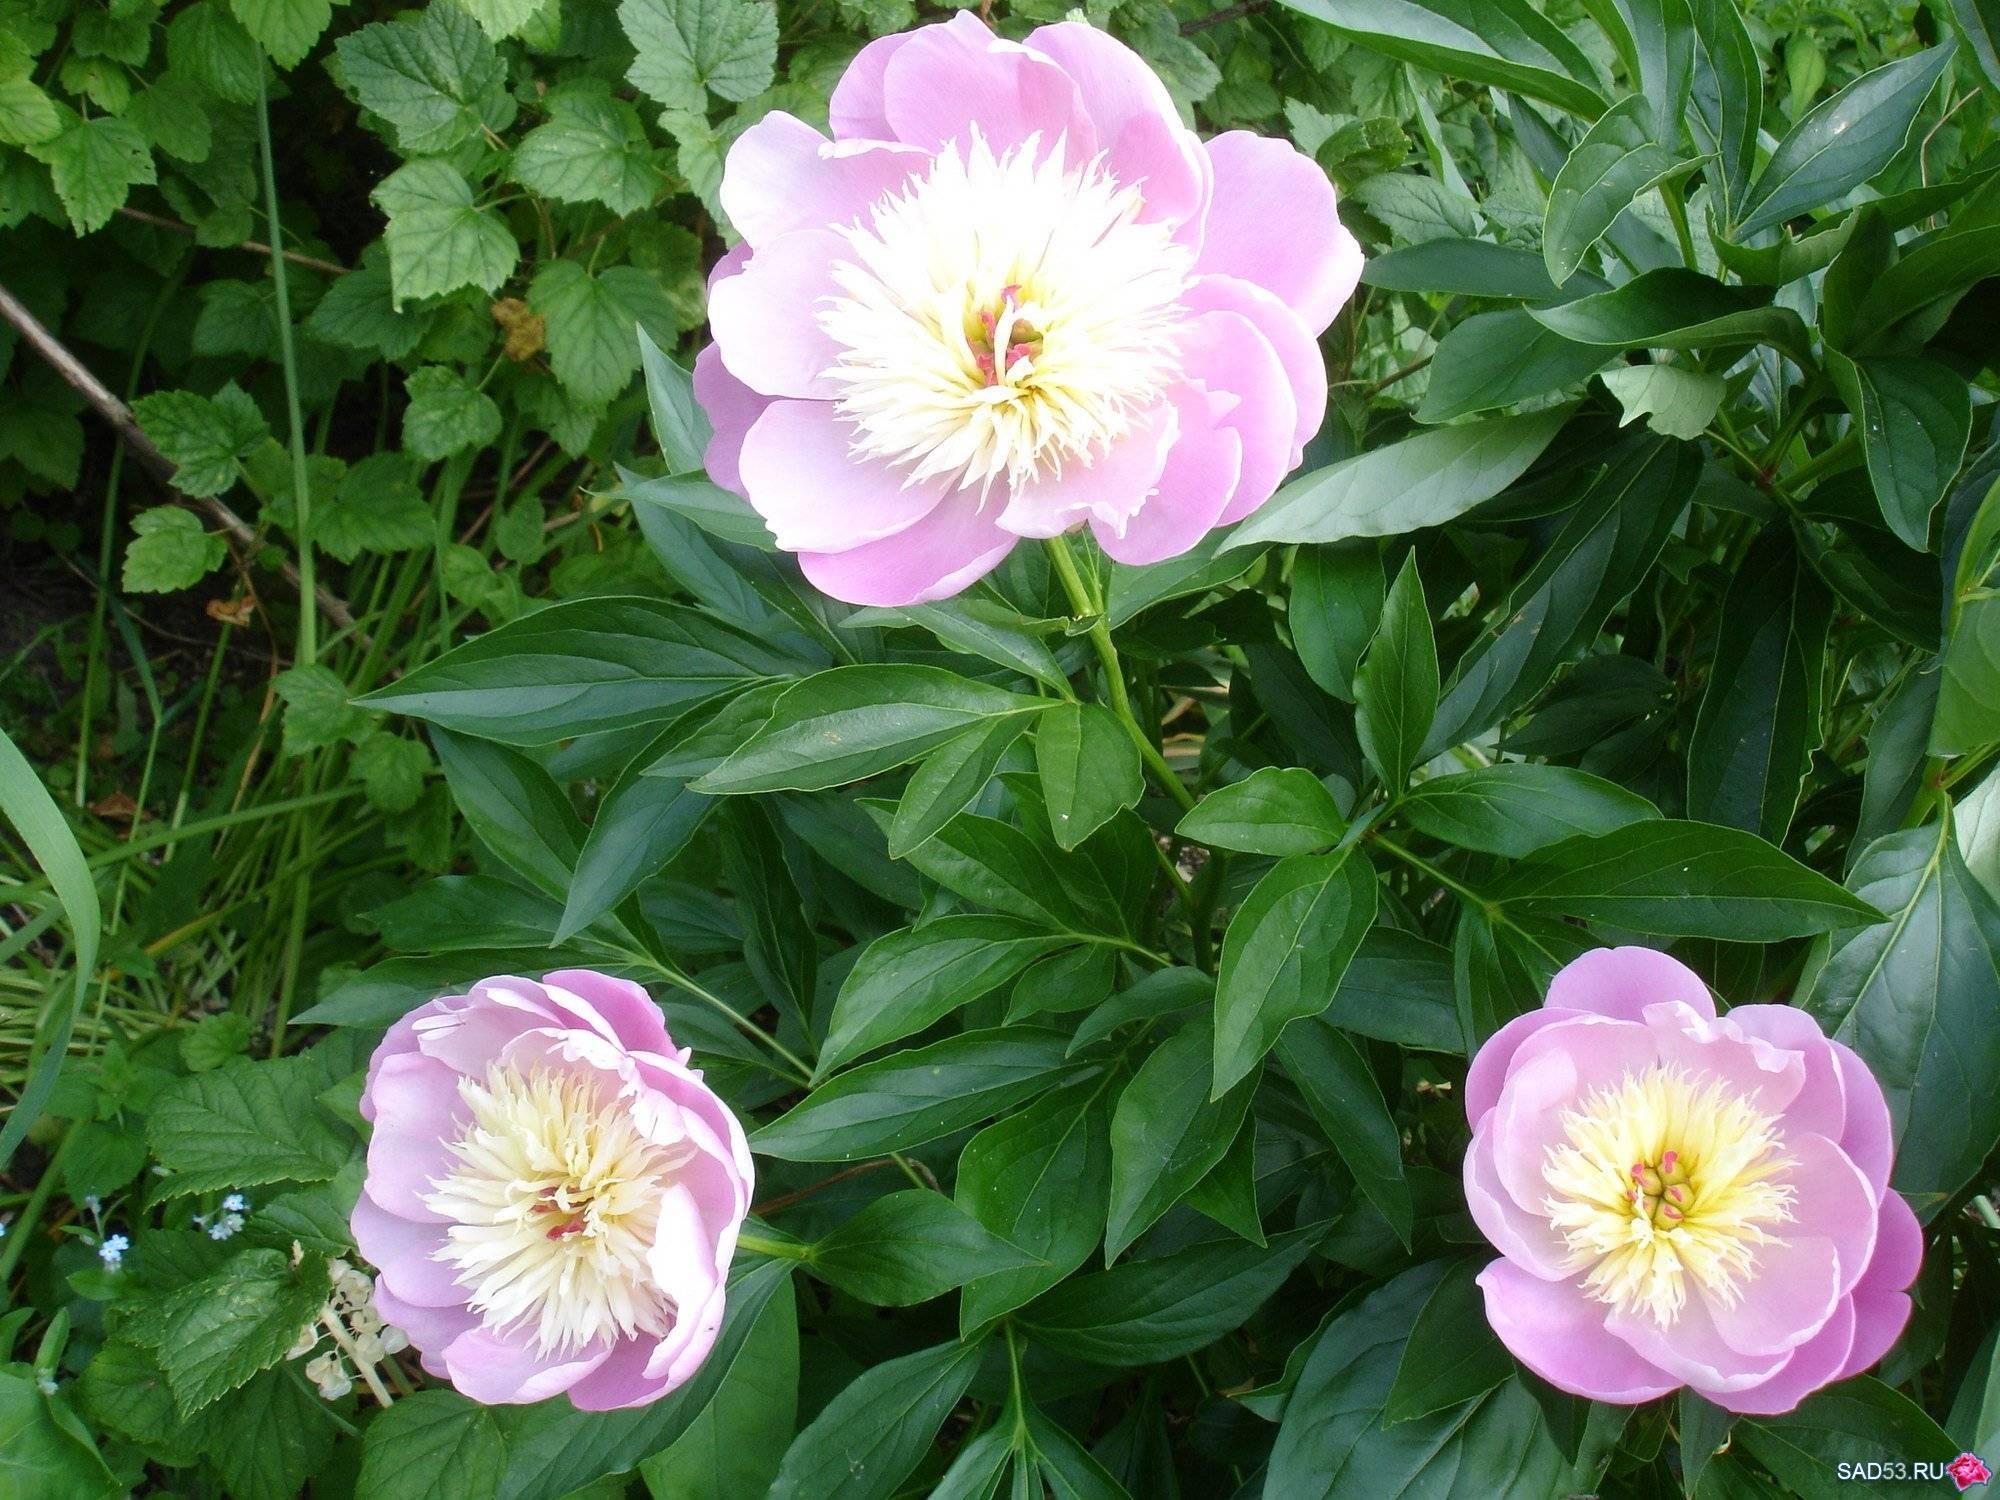 Пион боул оф бьюти (paeonia bowl of beauty) — выращивание на участке